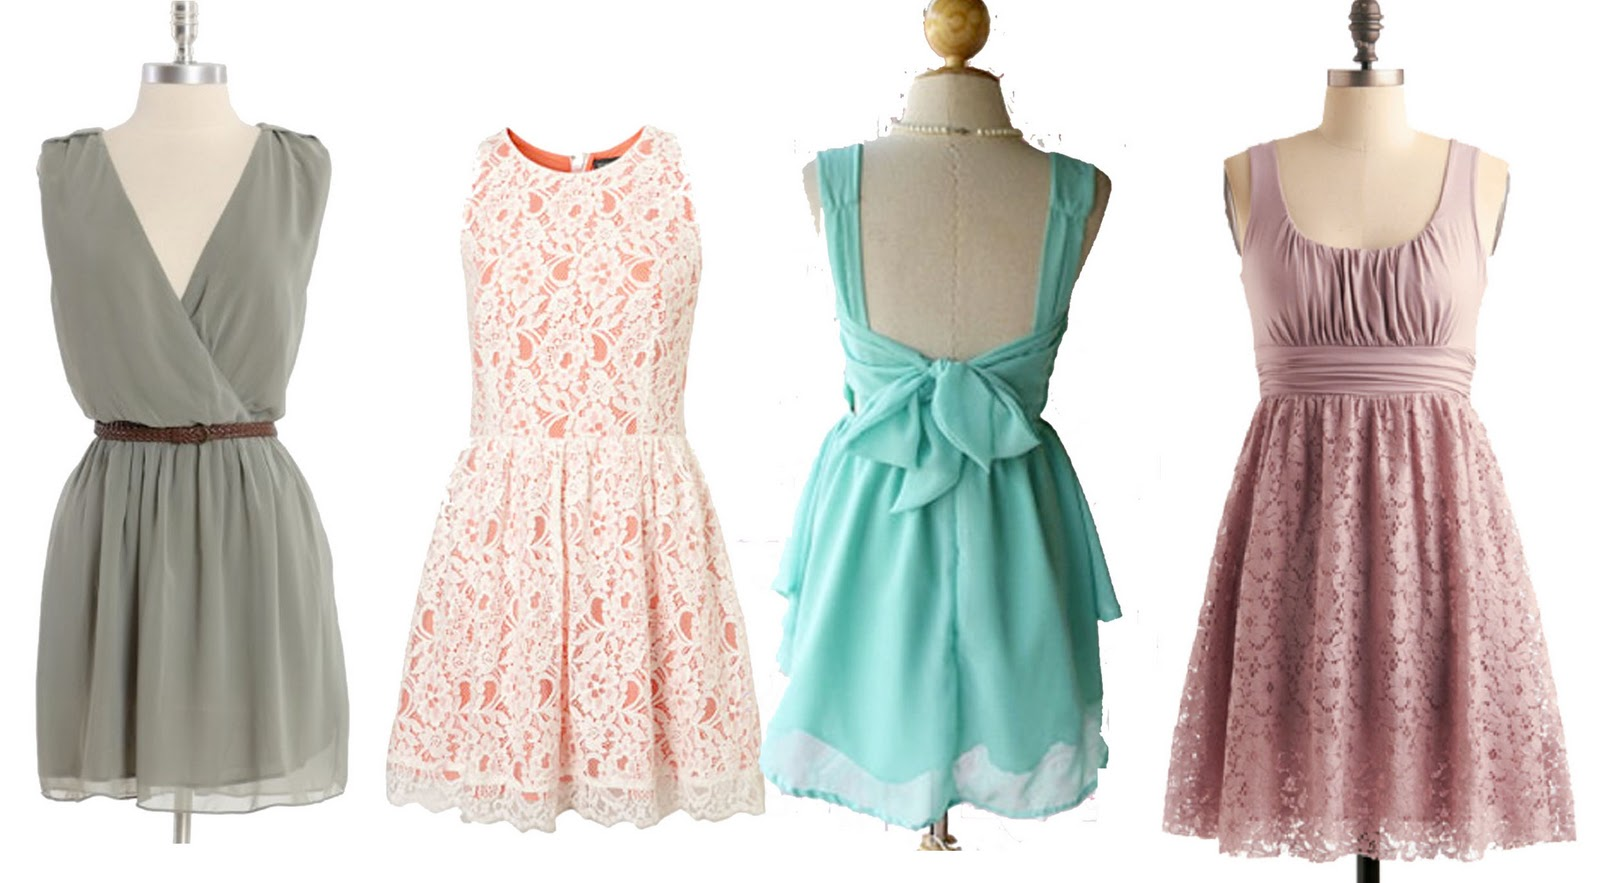 Pretty Party Dresses - Formal Dresses